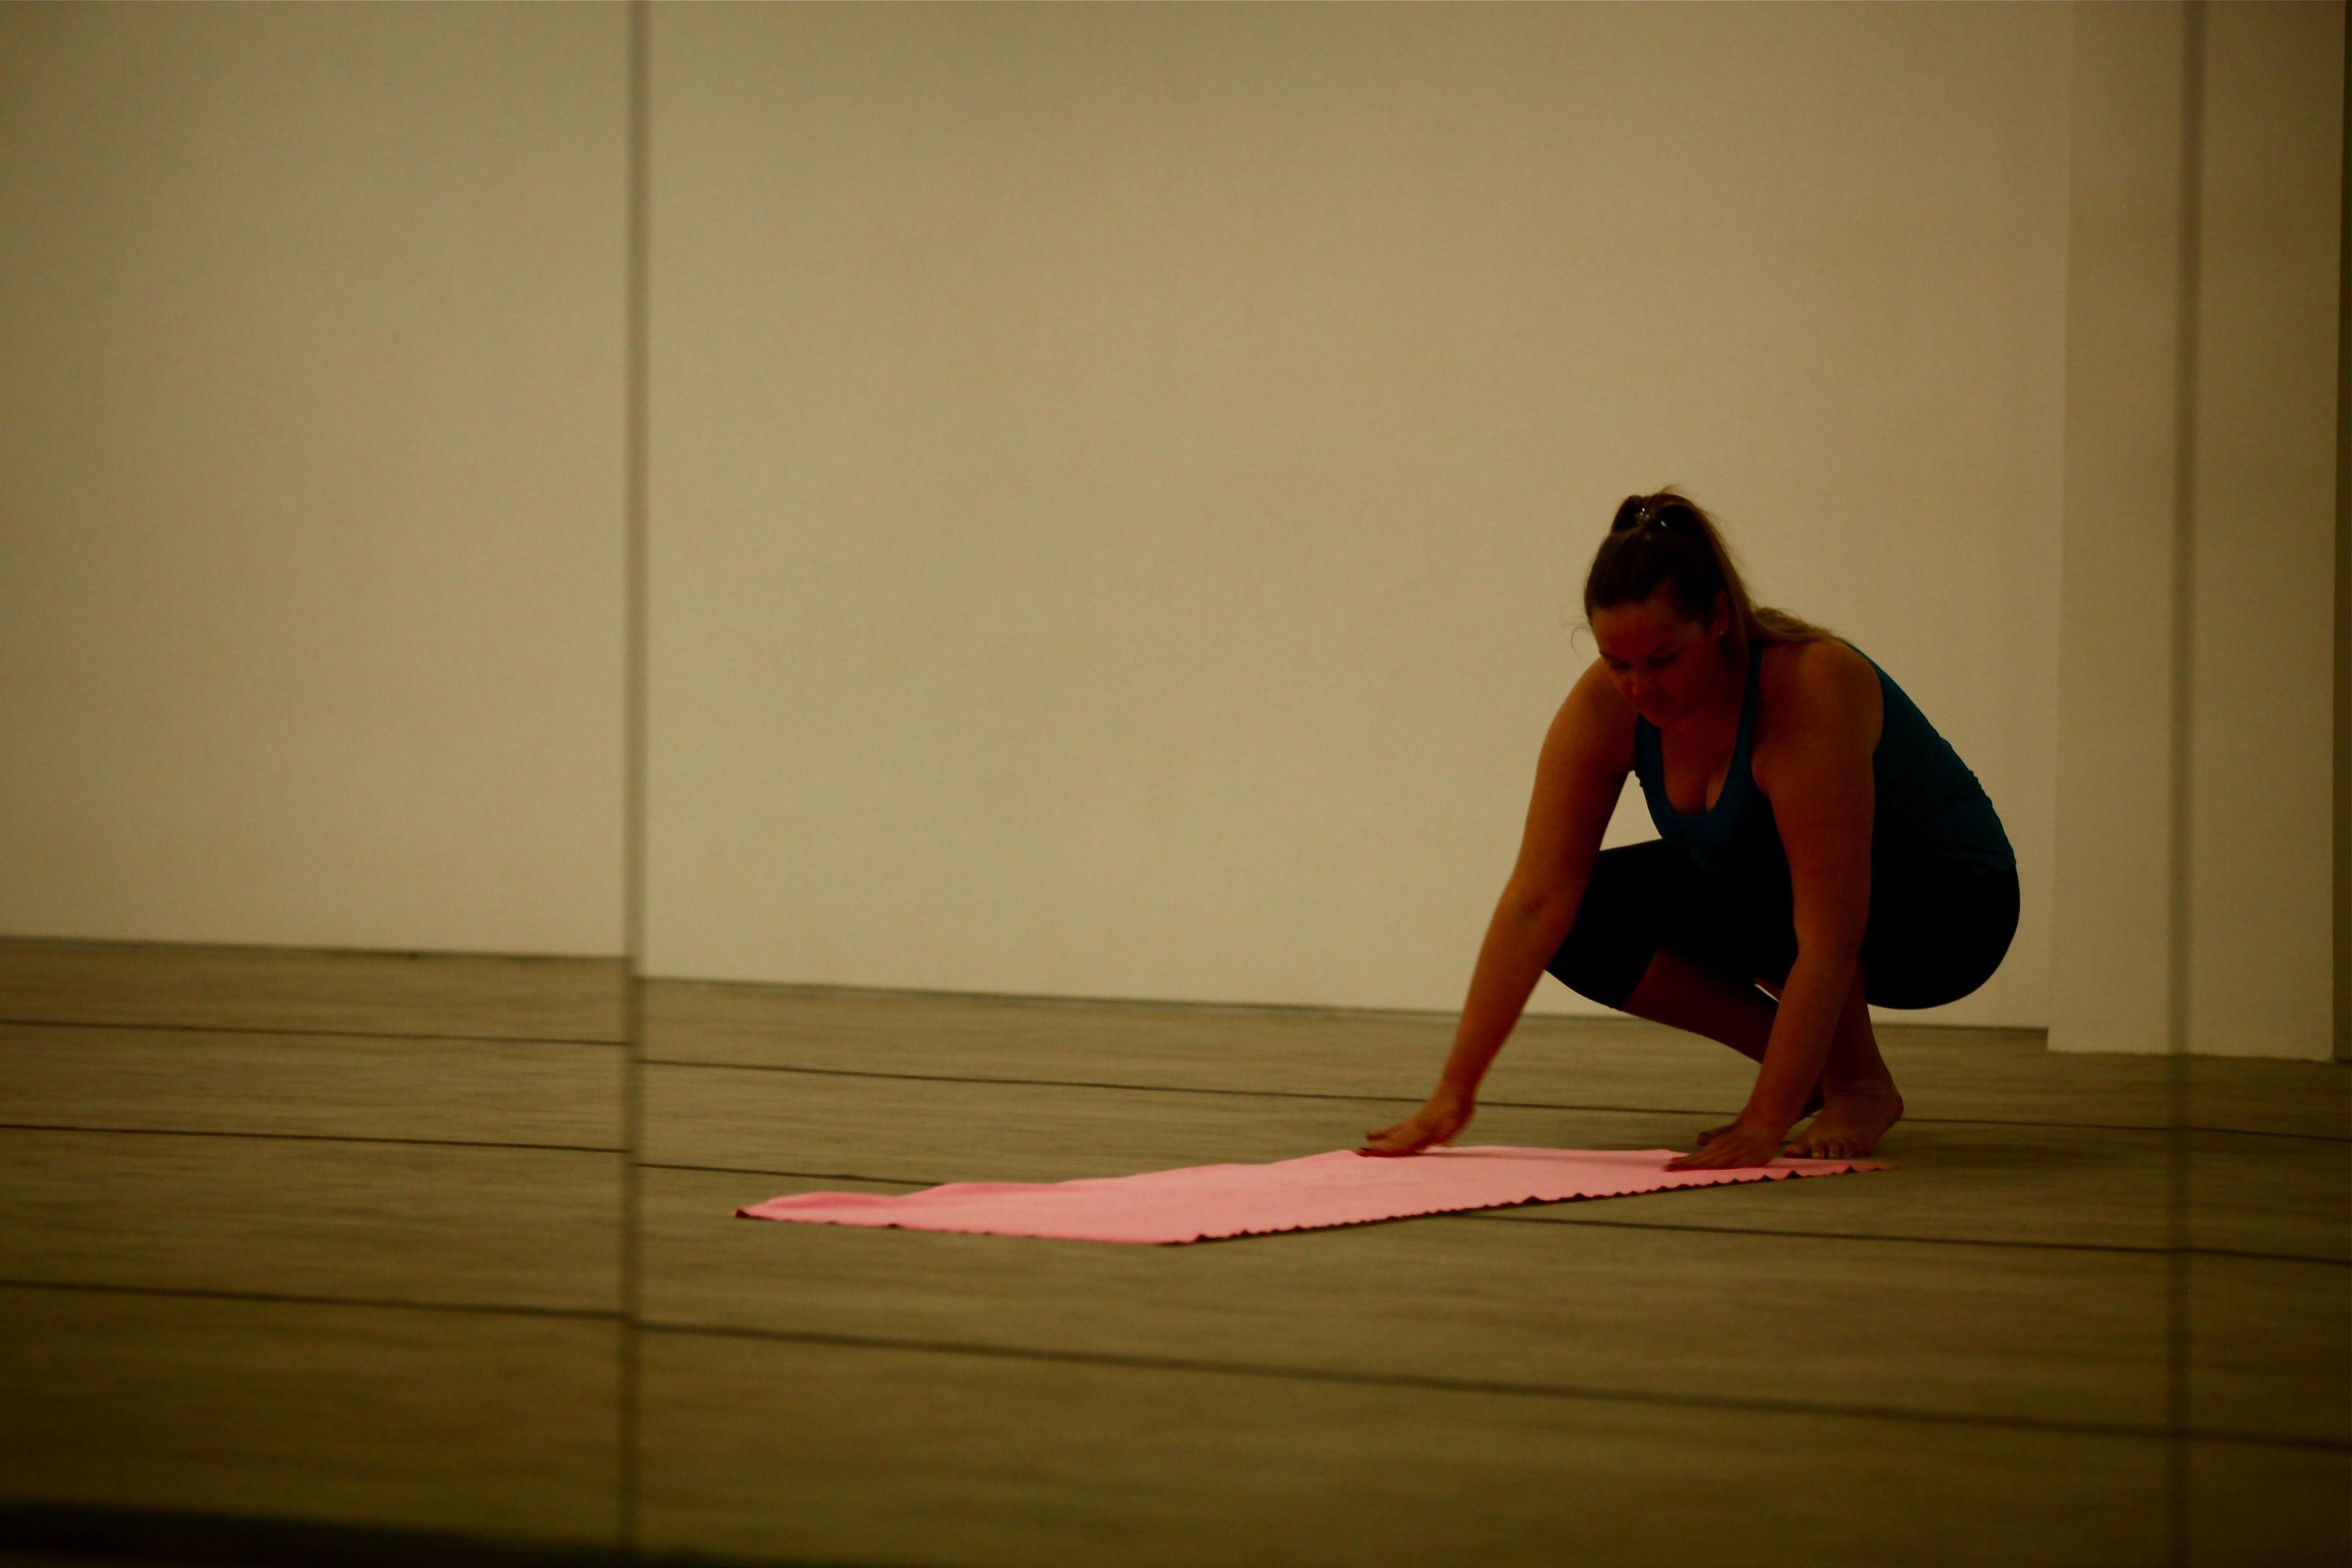 sweat drying yoga and non pin to slip bikram mat towel mats absorbing quick hot